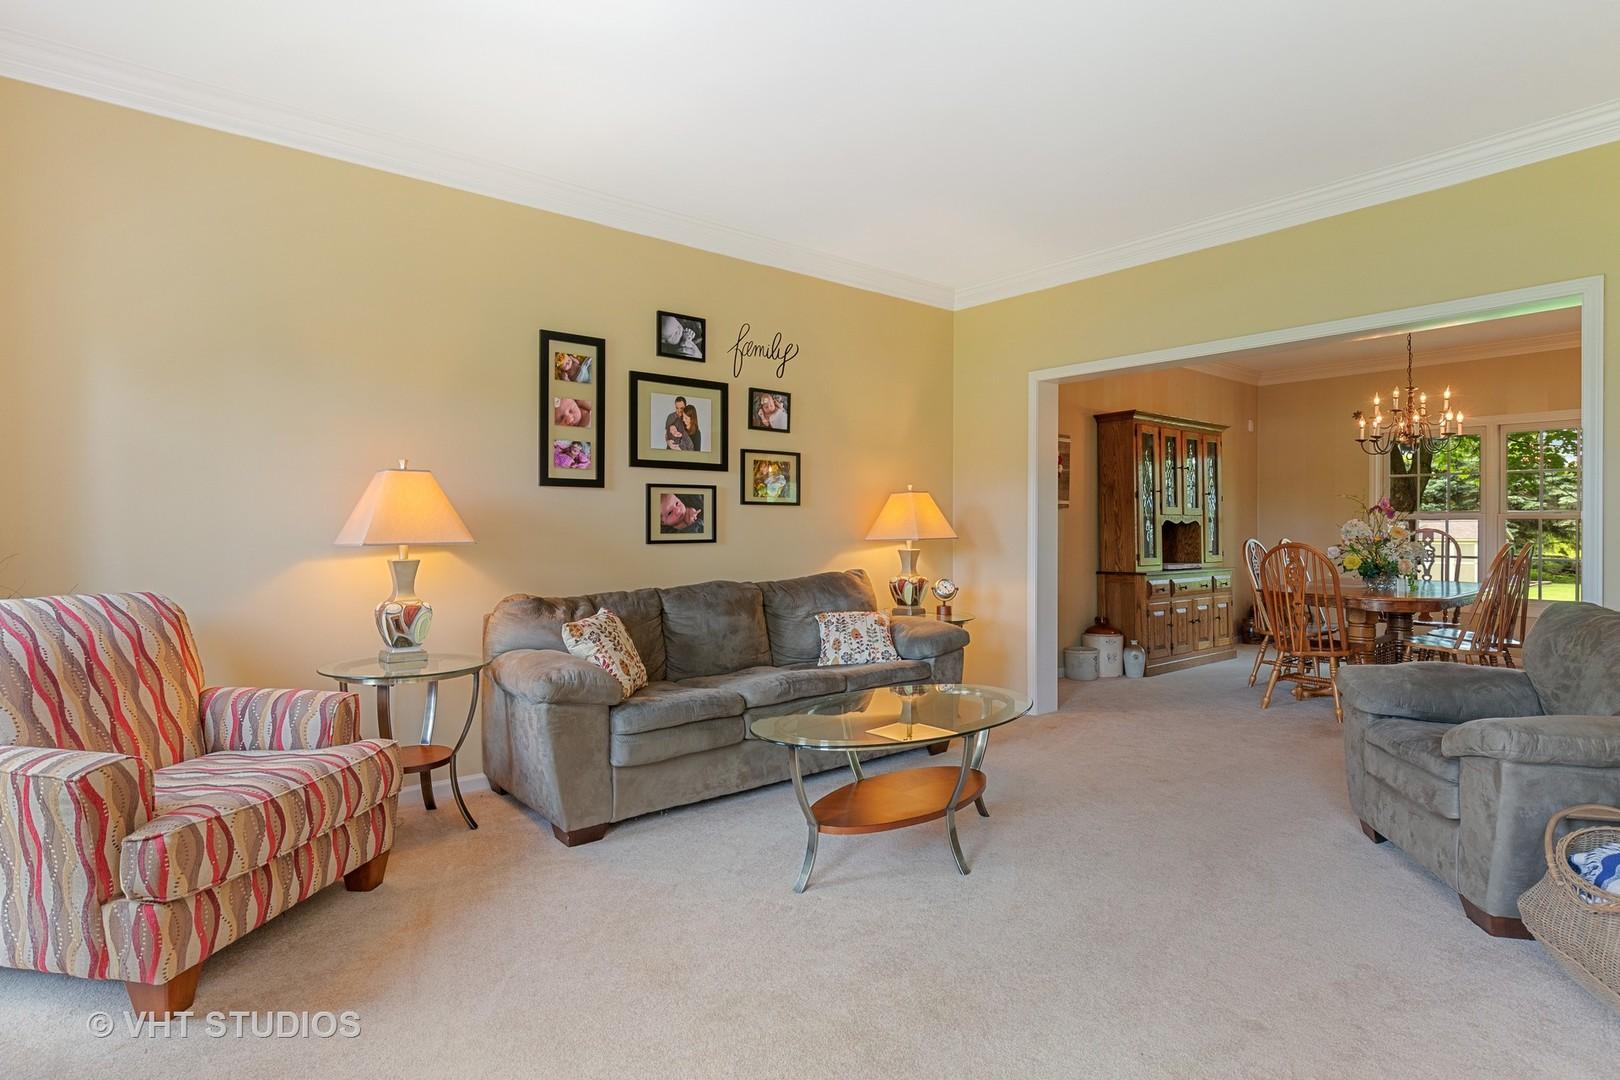 43W535 COLEMAN, ST. CHARLES, Illinois, 60175